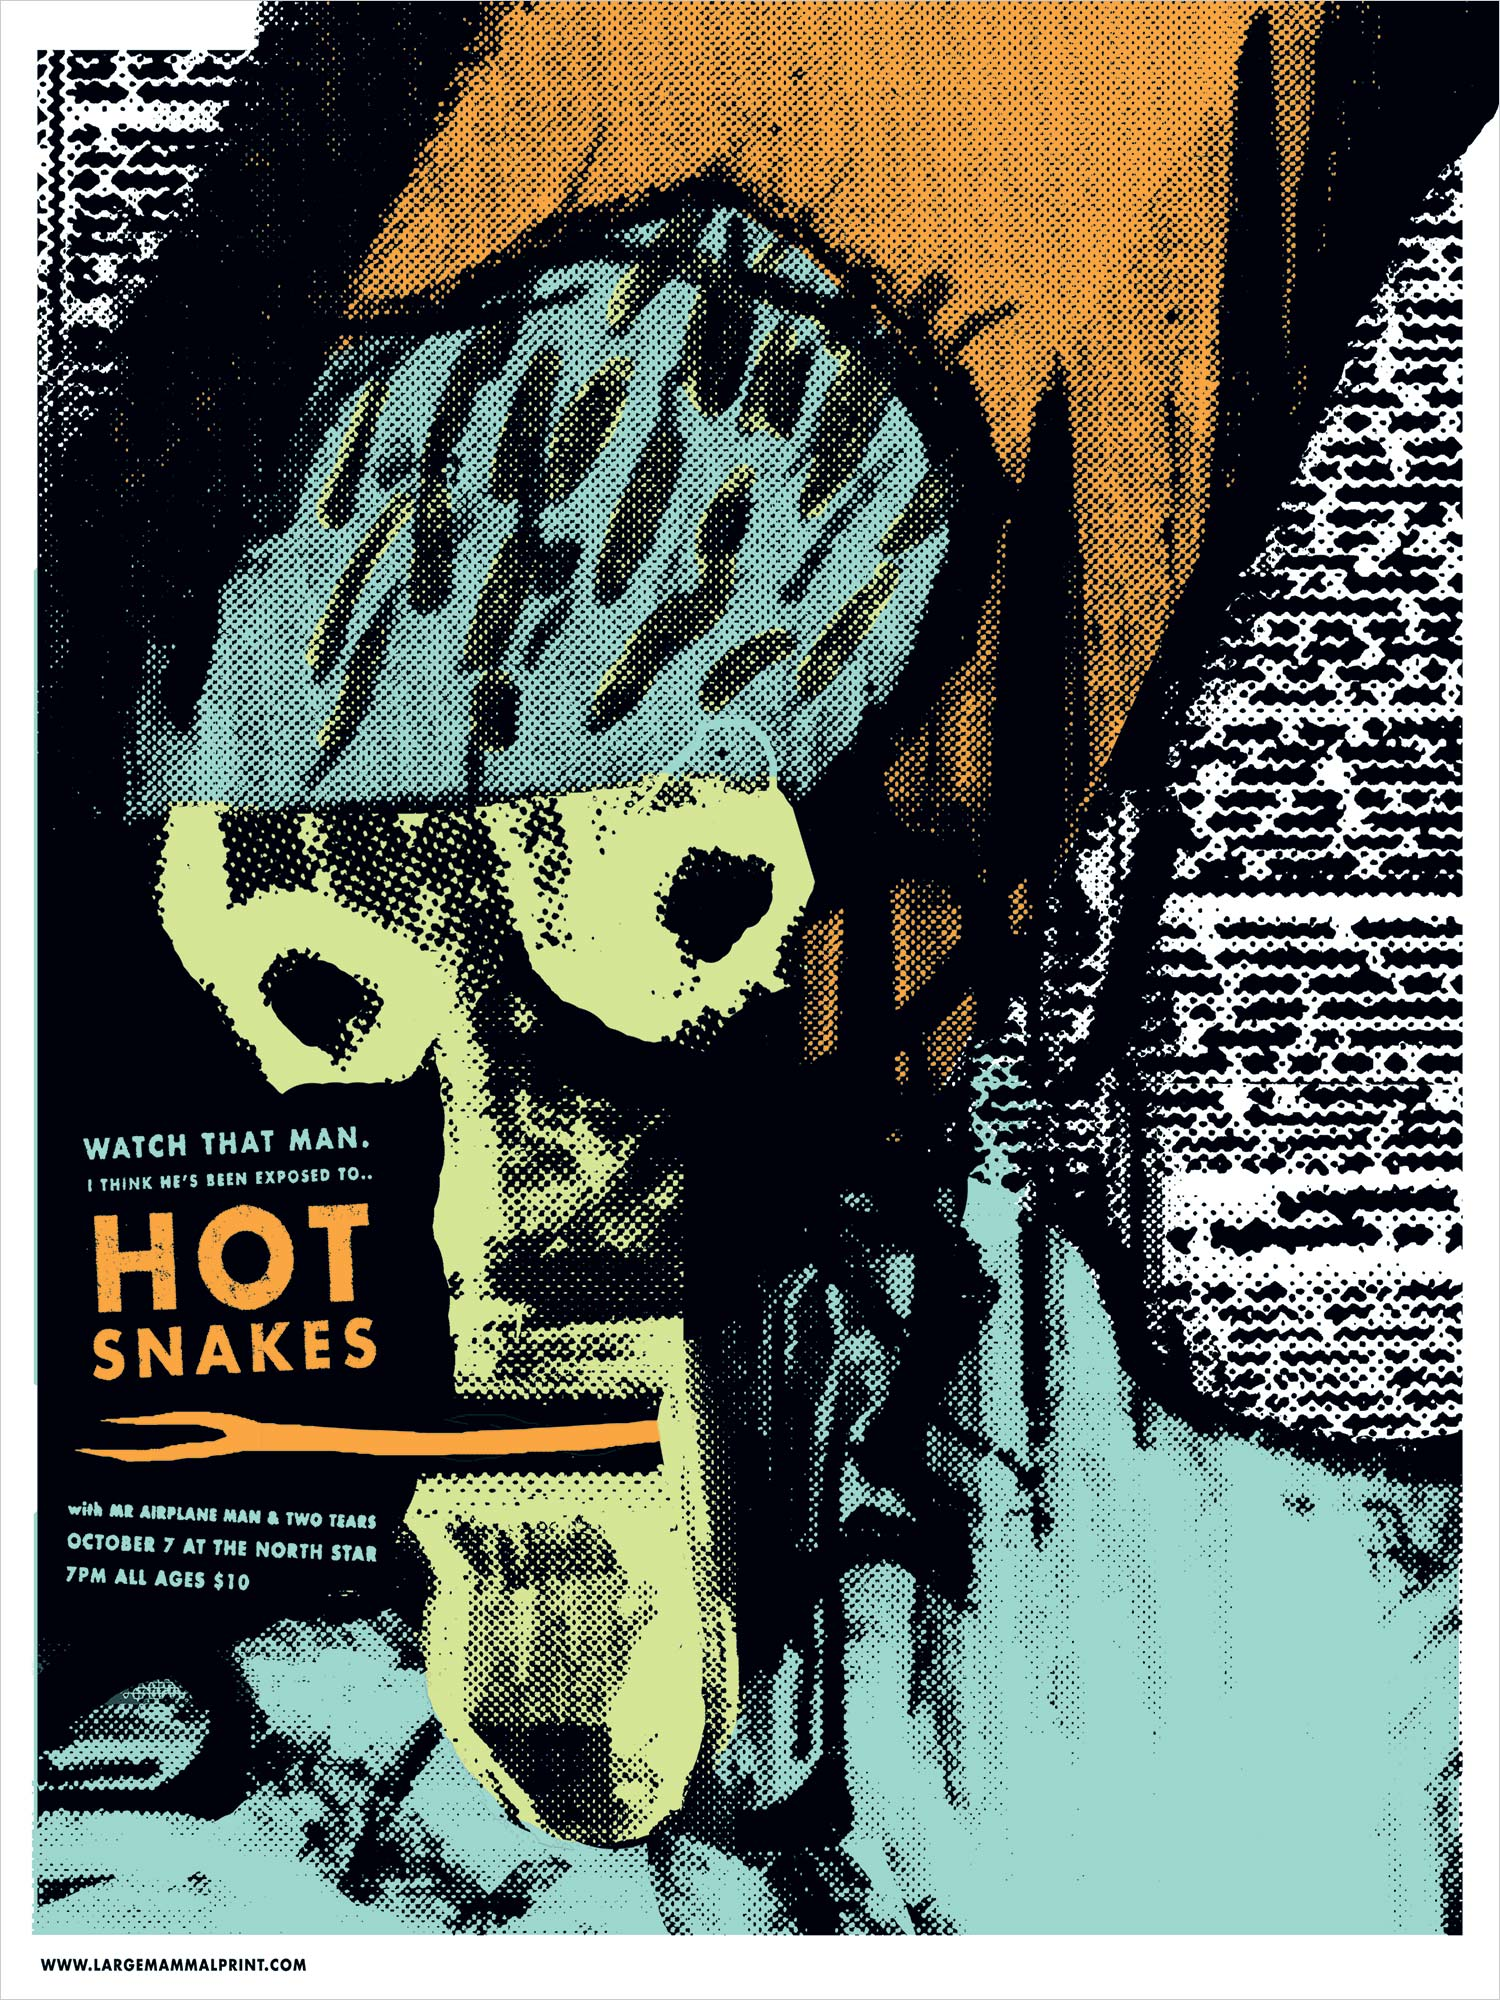 HotSnakes_1500.jpg